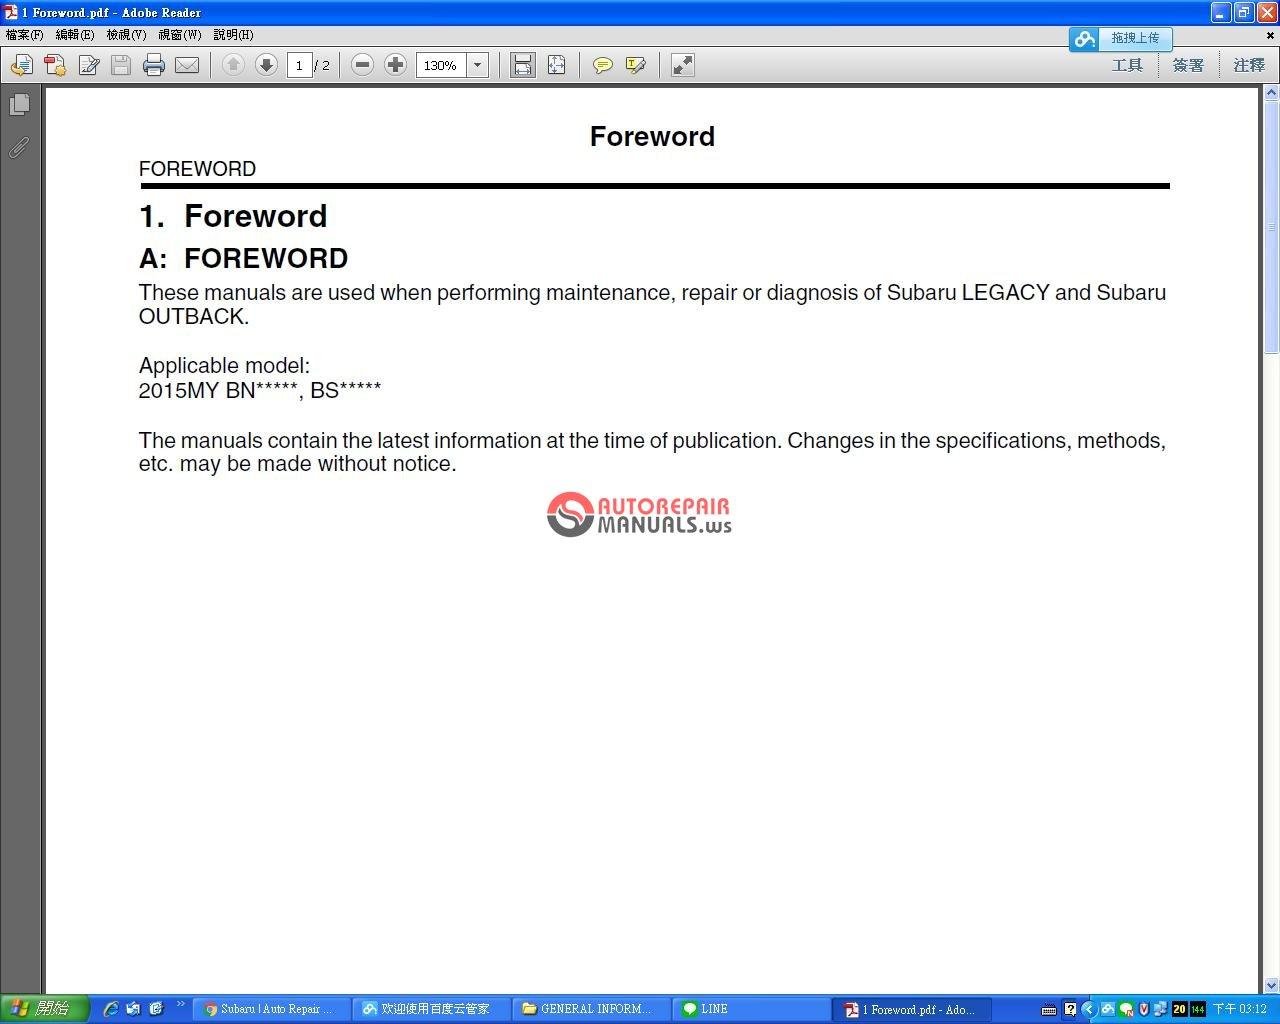 subaru forester 2000 service repair manual full download. Black Bedroom Furniture Sets. Home Design Ideas